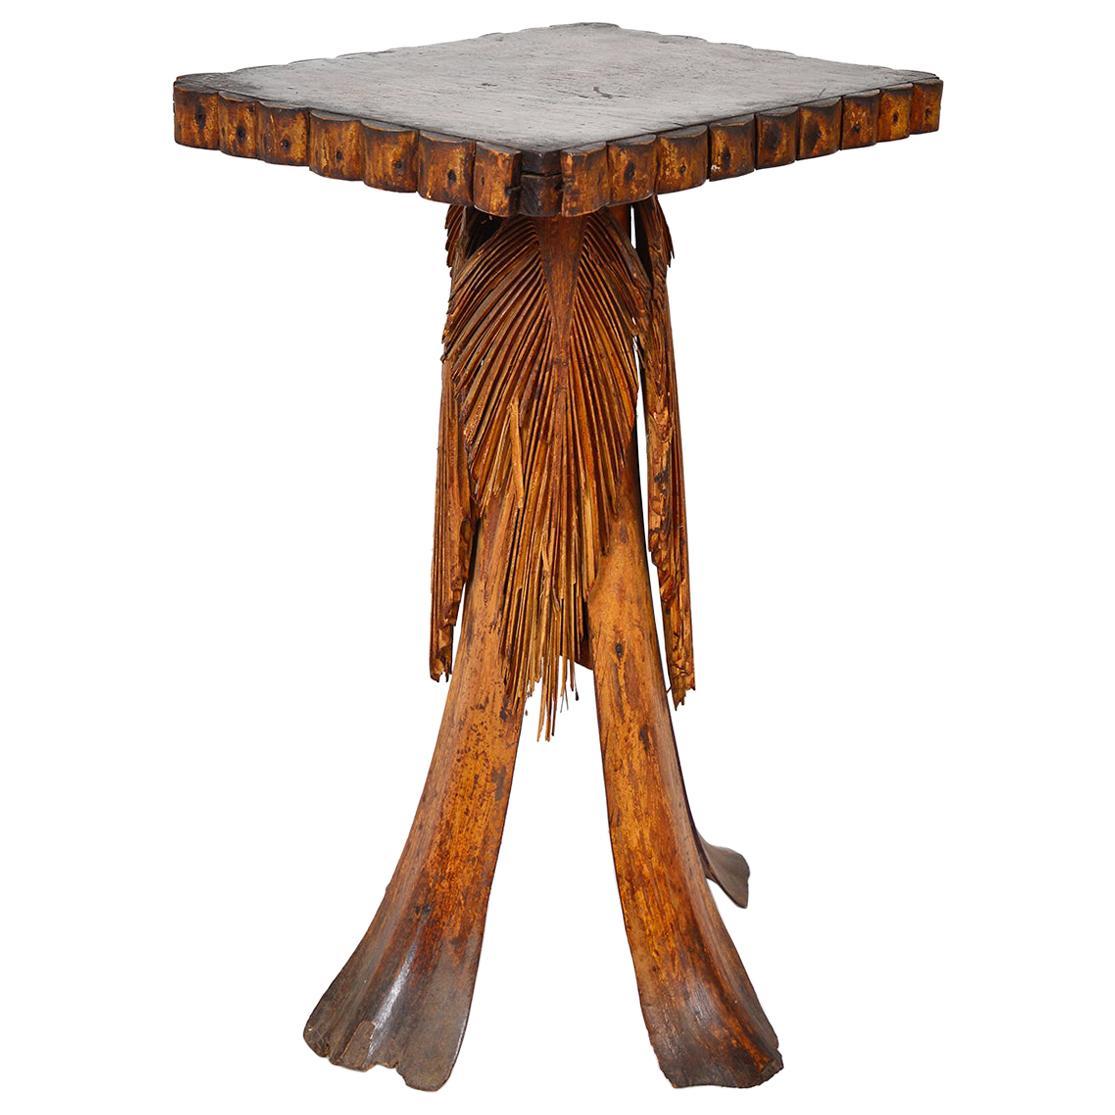 Antique Folk Art Palm Frond Wood Occasional Table Tramp Art Tiki Decorative